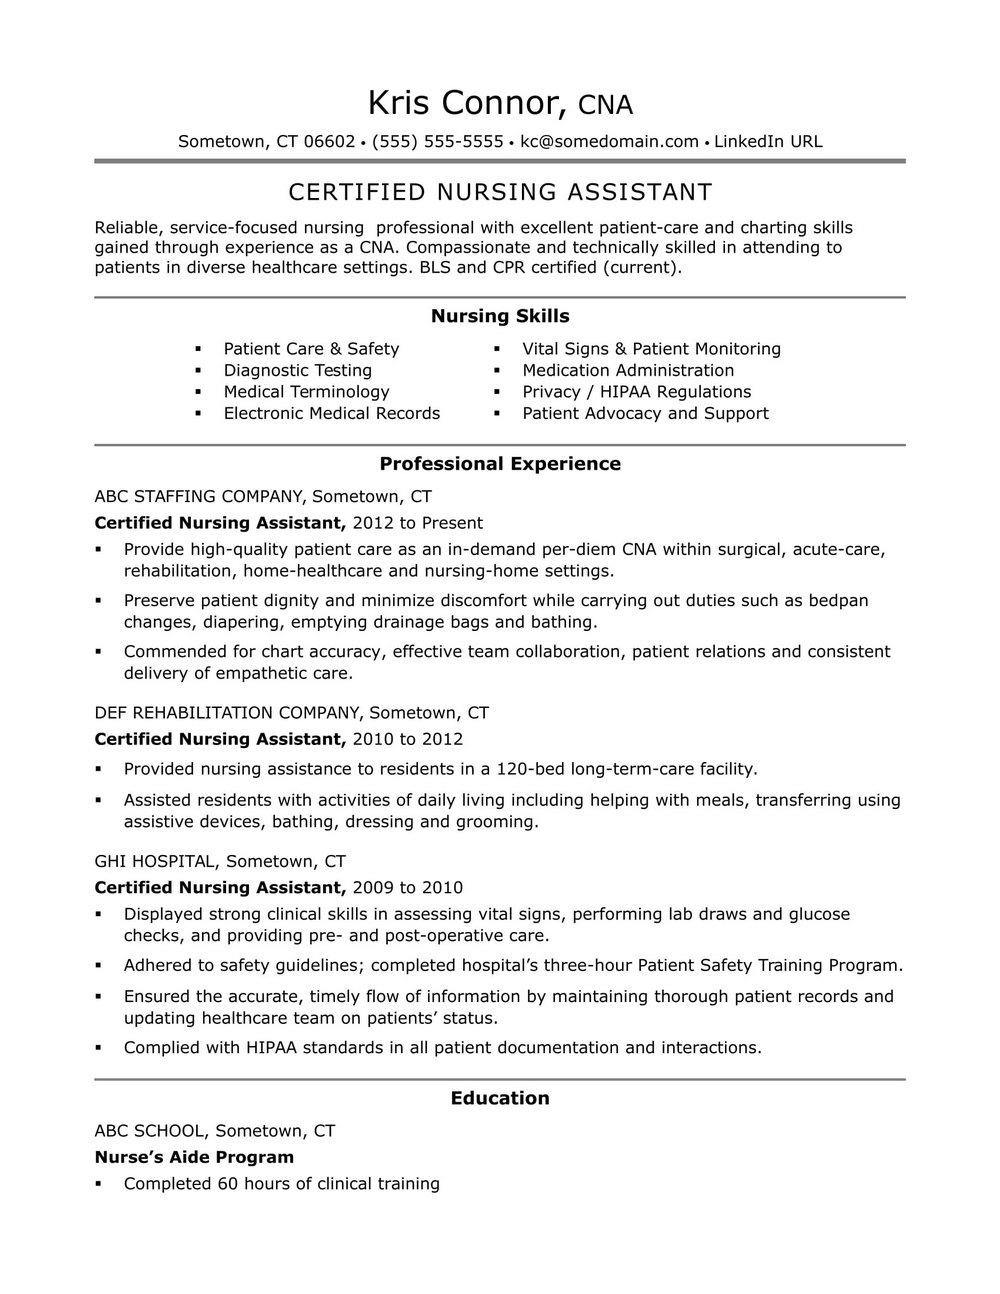 Free Cna Resume Templates